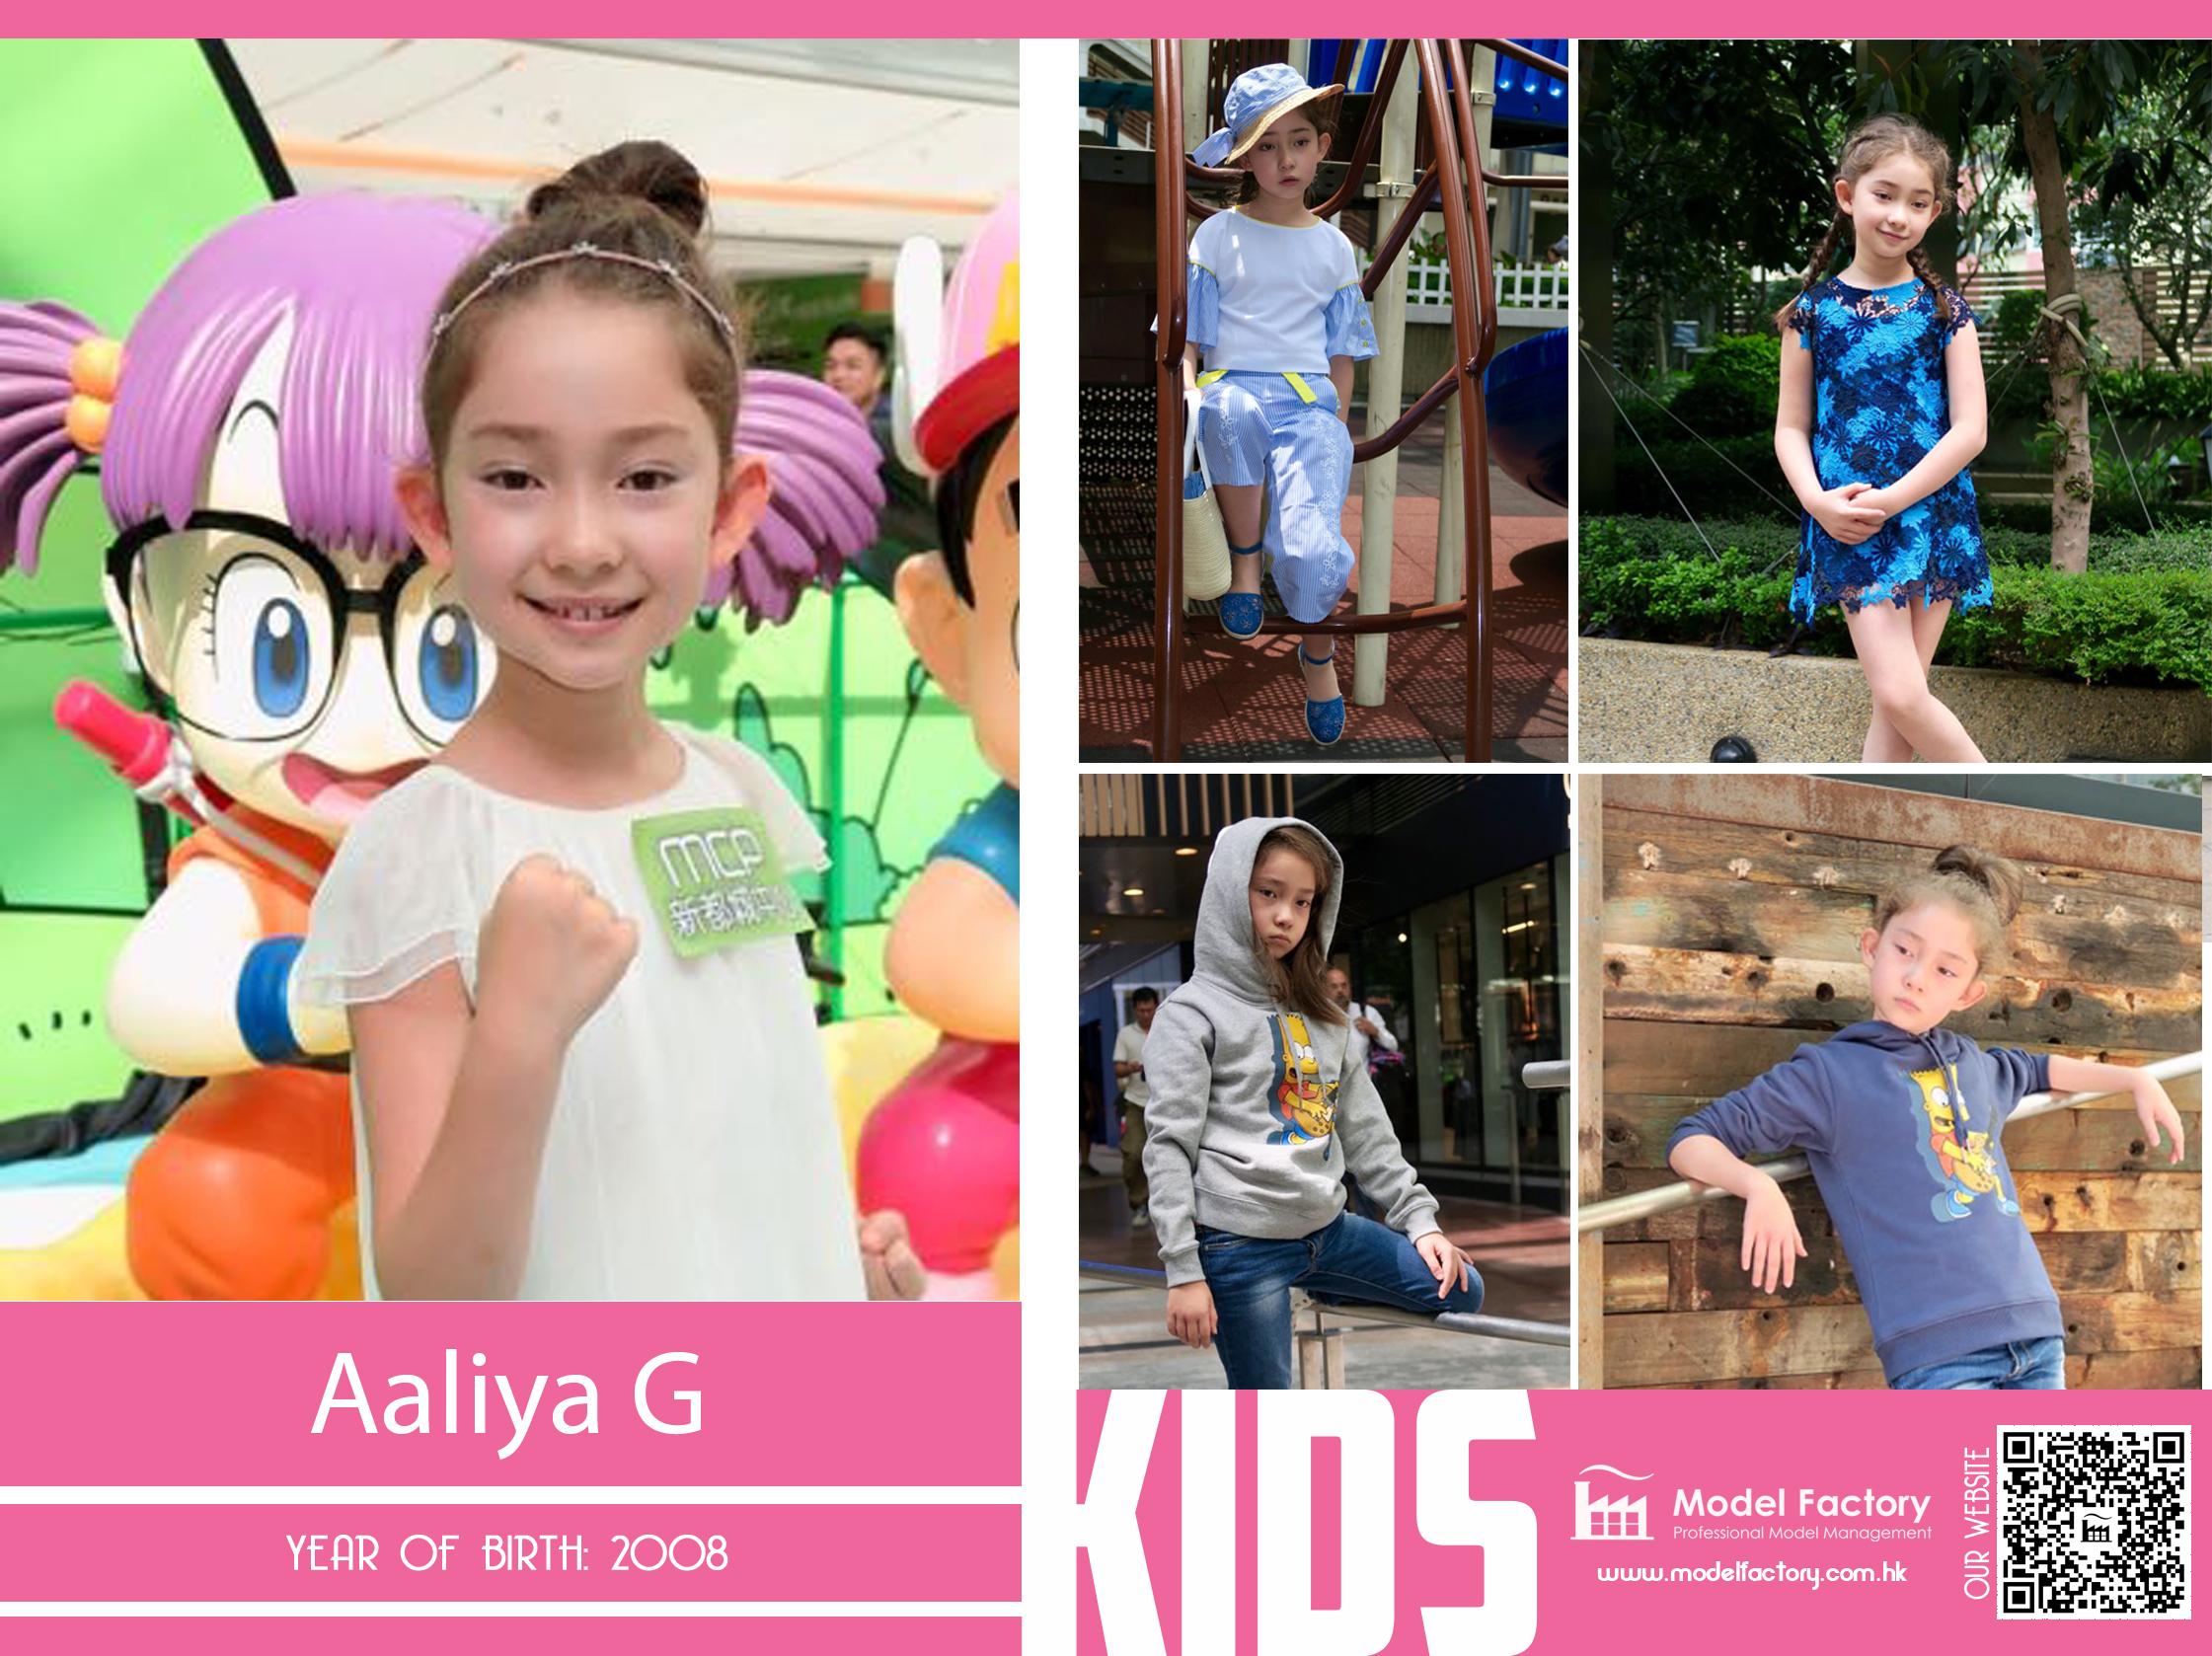 Model Factory Mix Kids Model Aaliya G